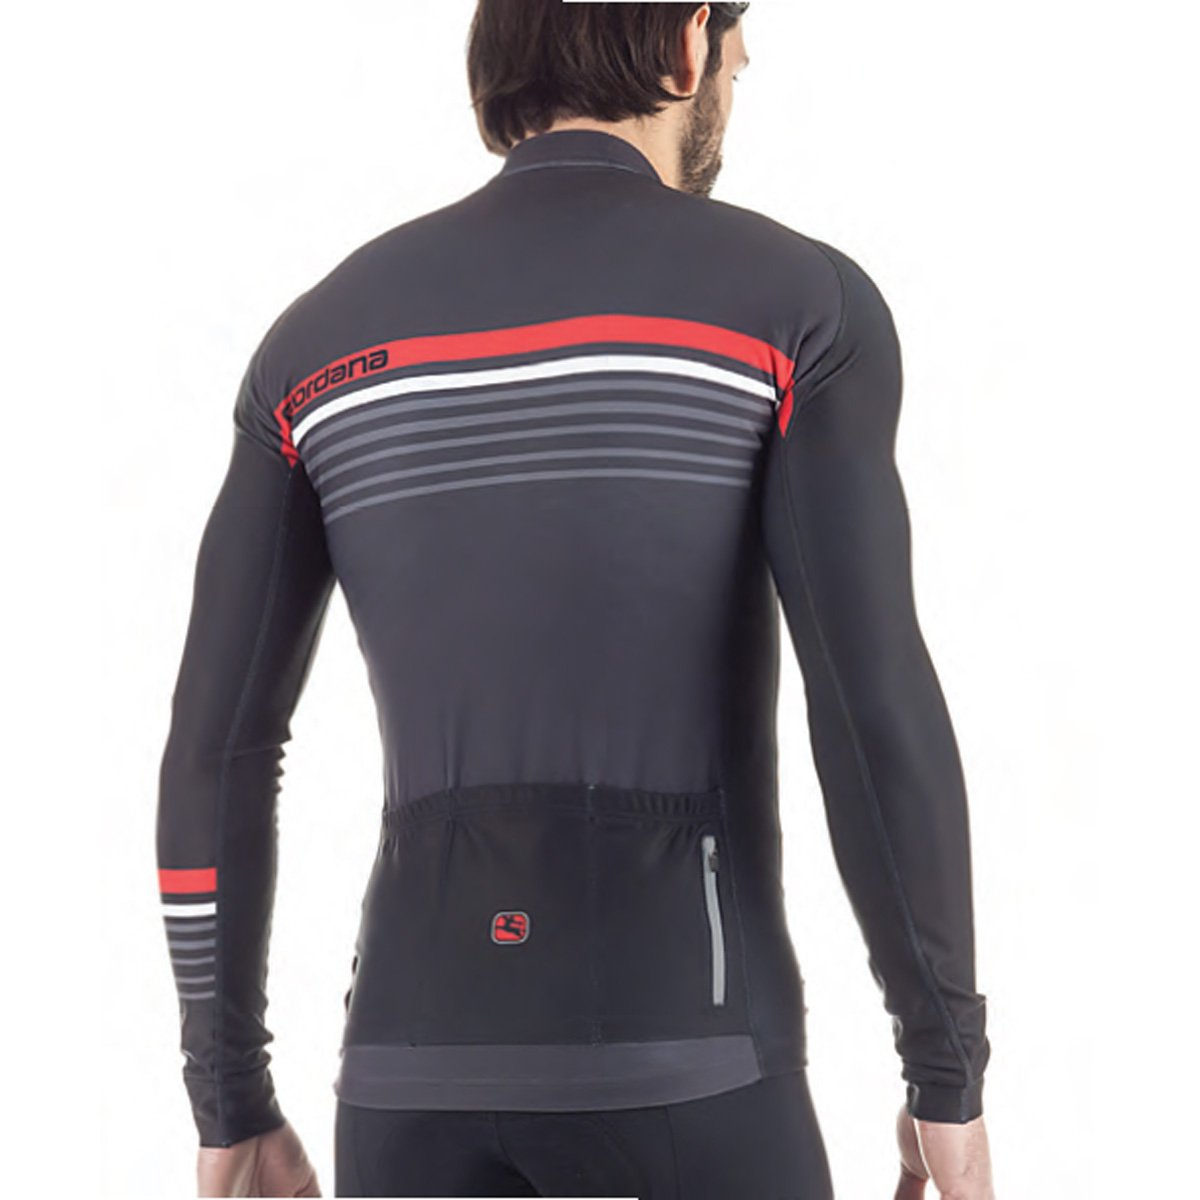 Giordana fr-c Sette長袖Jersey – Men 's B0761ZRSR5 Large|Black/Red/Grey Black/Red/Grey Large